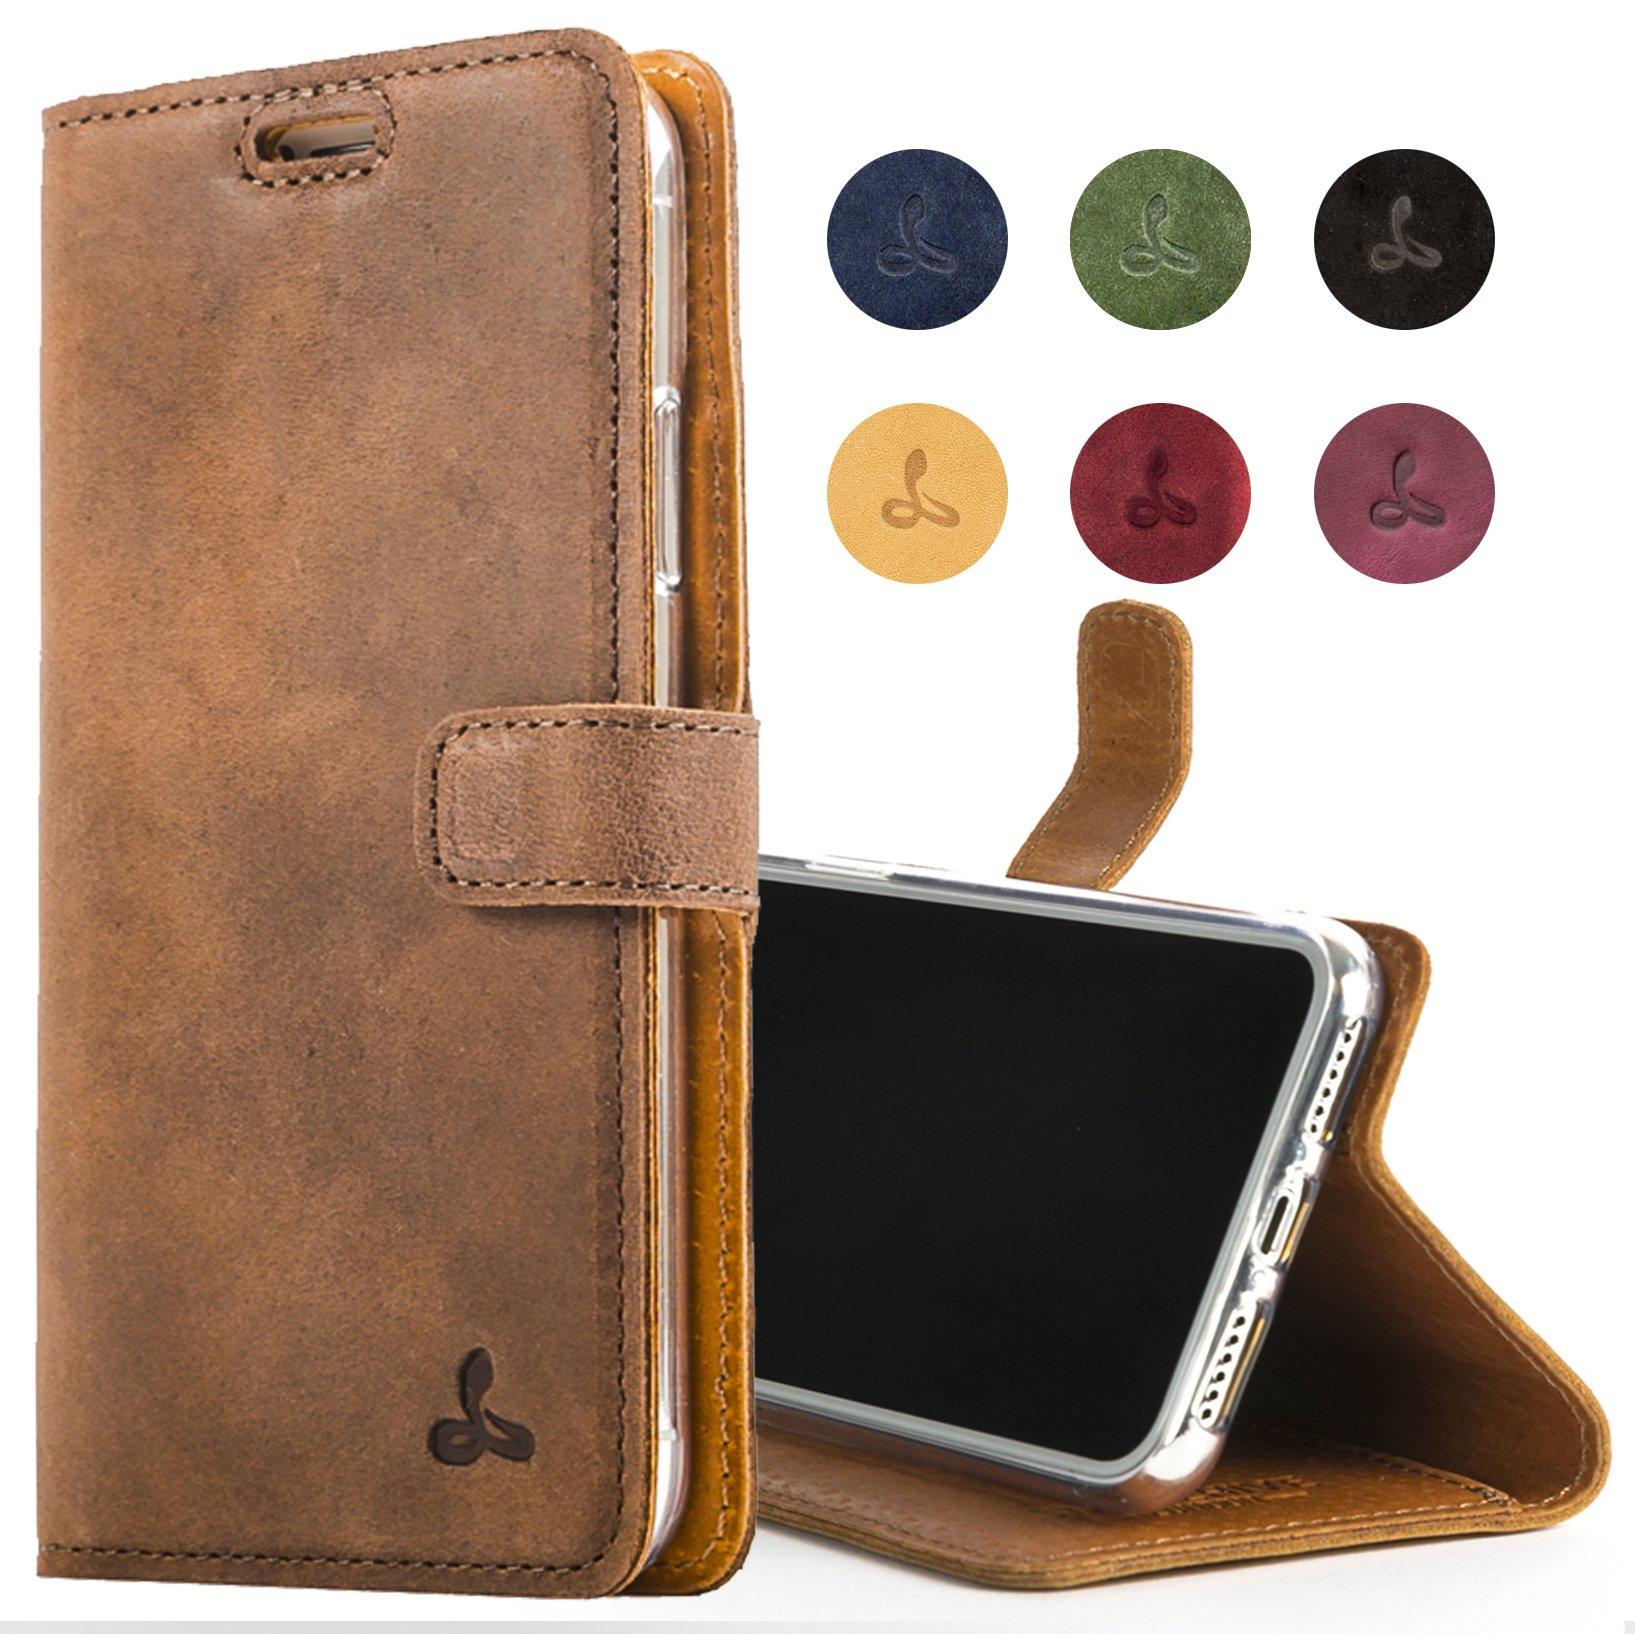 iPhone Snakehive Genuine Leather Handmade